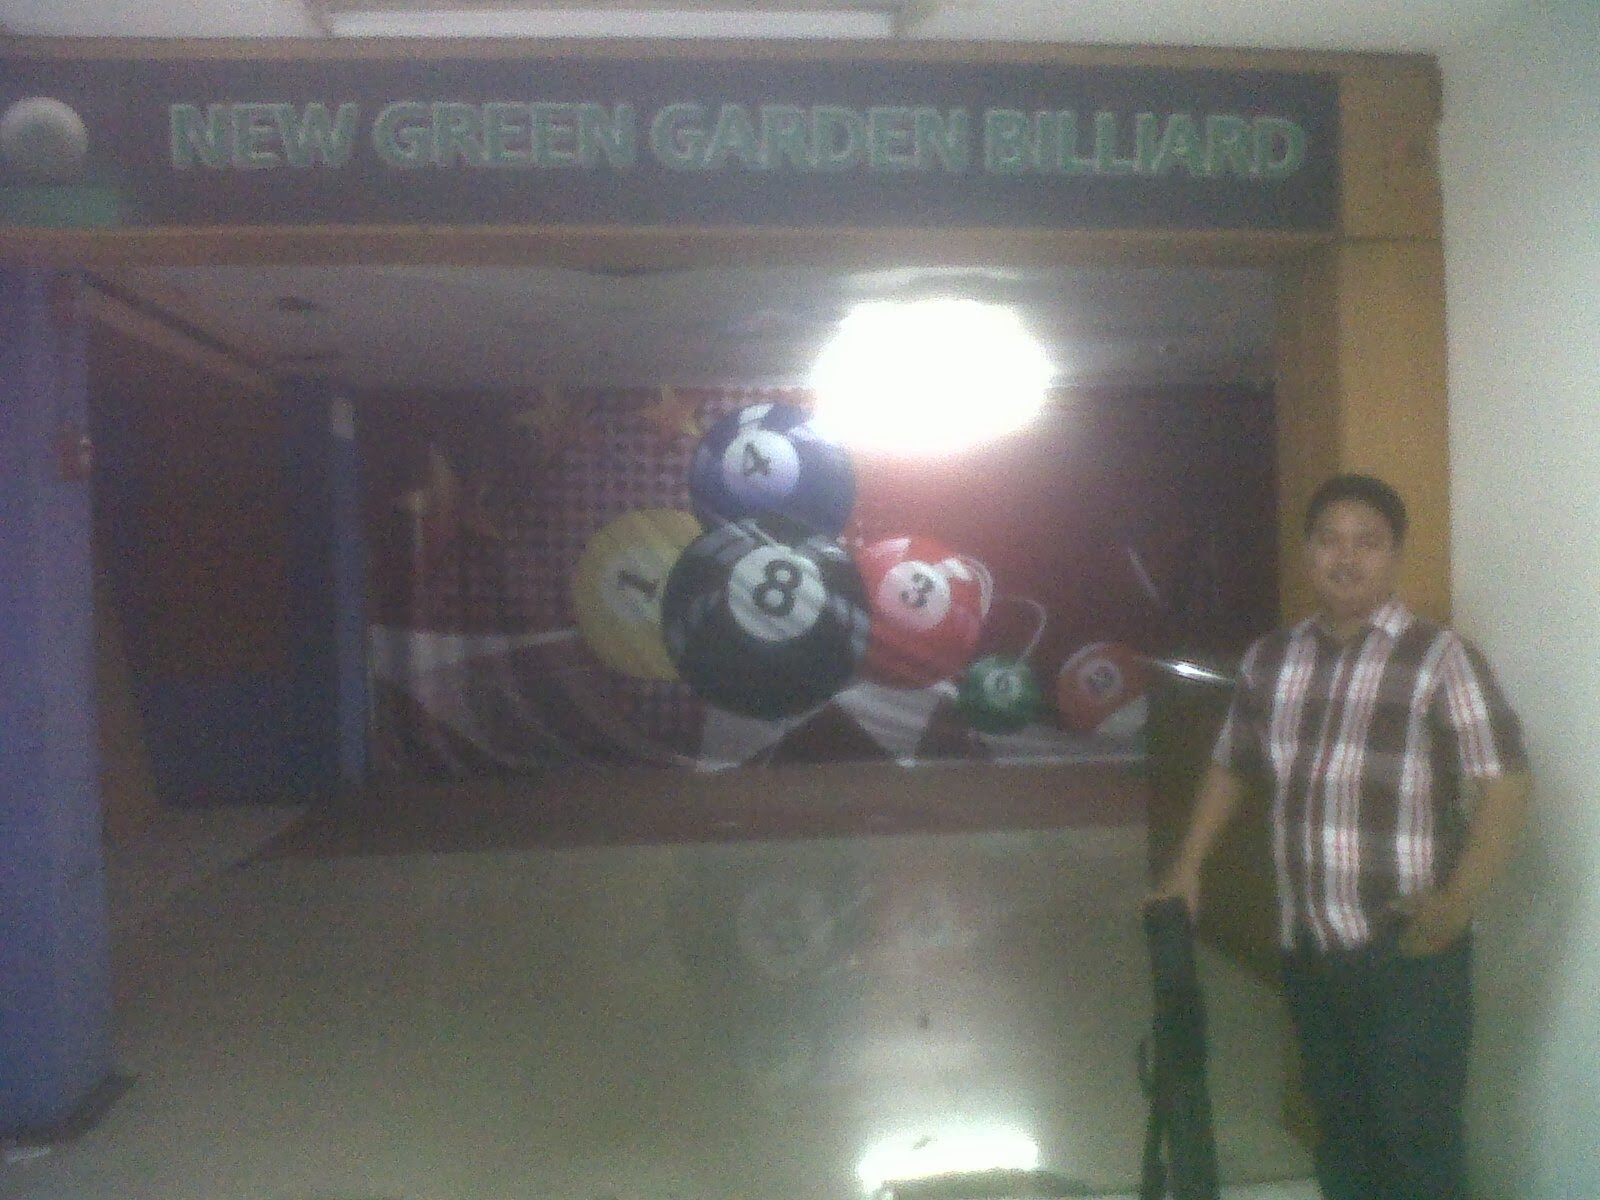 Billiardholic Informasi Tempat Billiard Bilyar Bilyard Di Jakarta Dan Sekitarnya New Green Garden Ngg Billiard Green Garden Jl Panjang Arteri Kedoya Kebon Jeruk Jakarta Barat